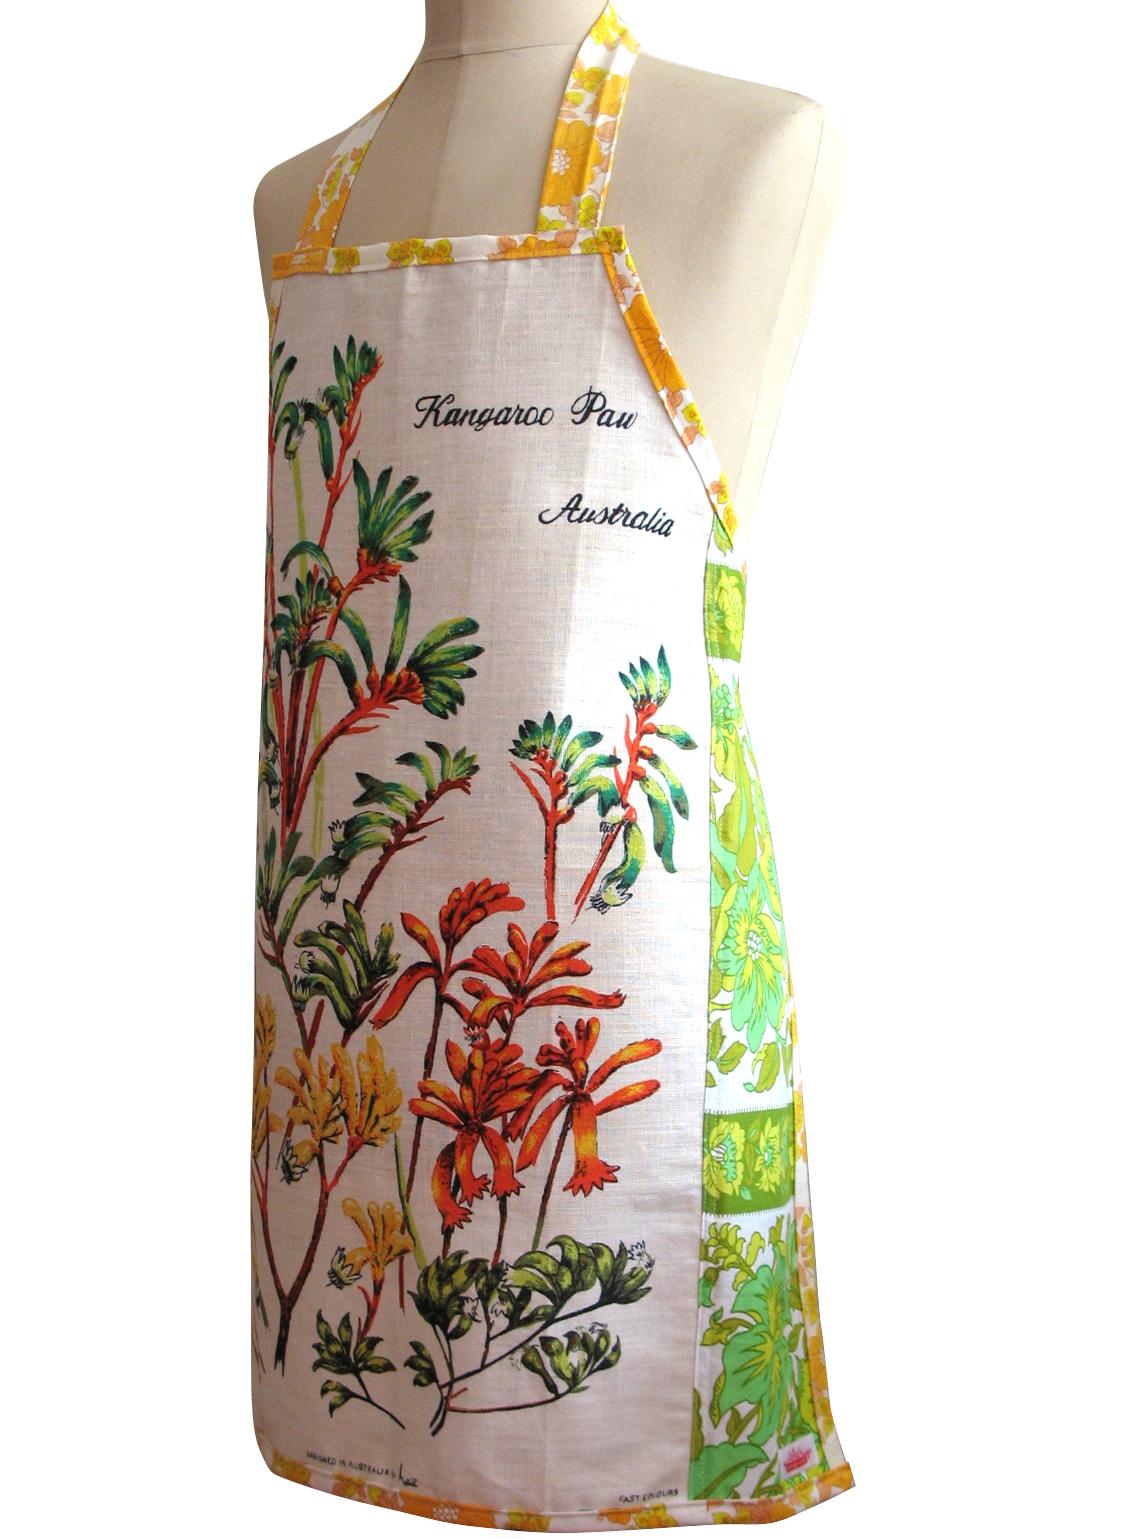 Blue apron australia - Metro Retro Vintage Australian Wildflowers Apron